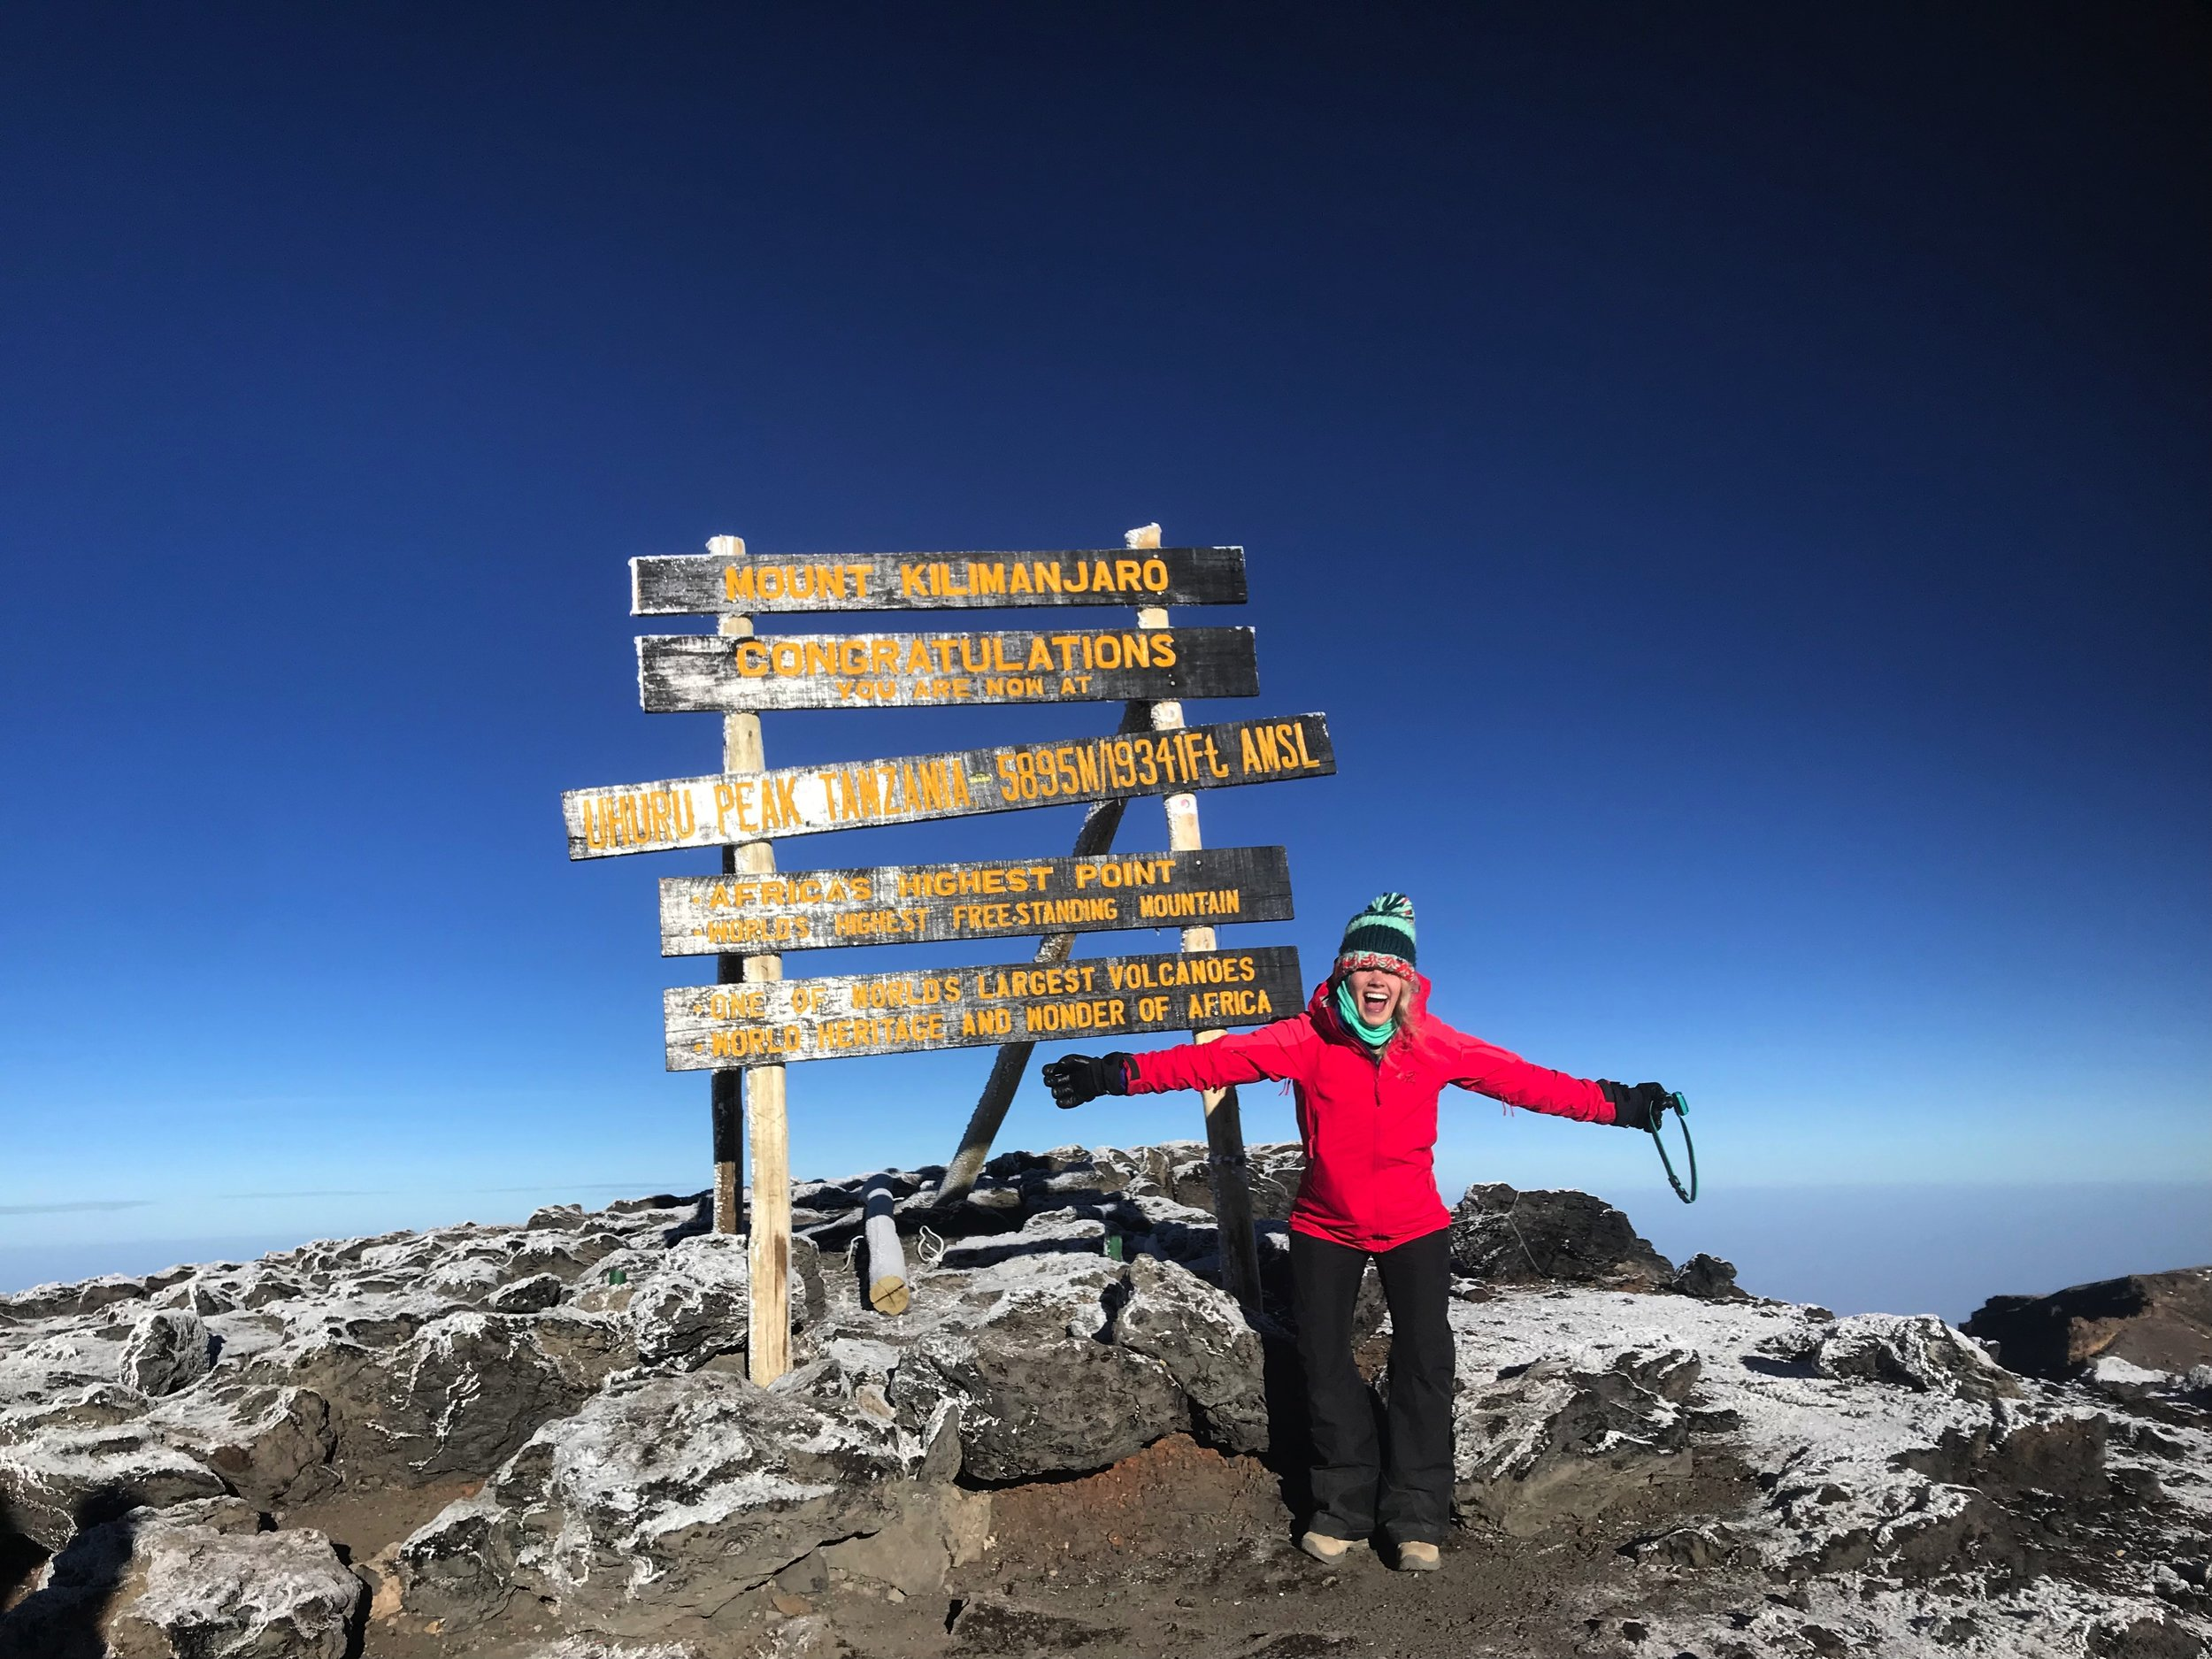 Kyla Cheatley at the Summit of Mount Kilimanjaro